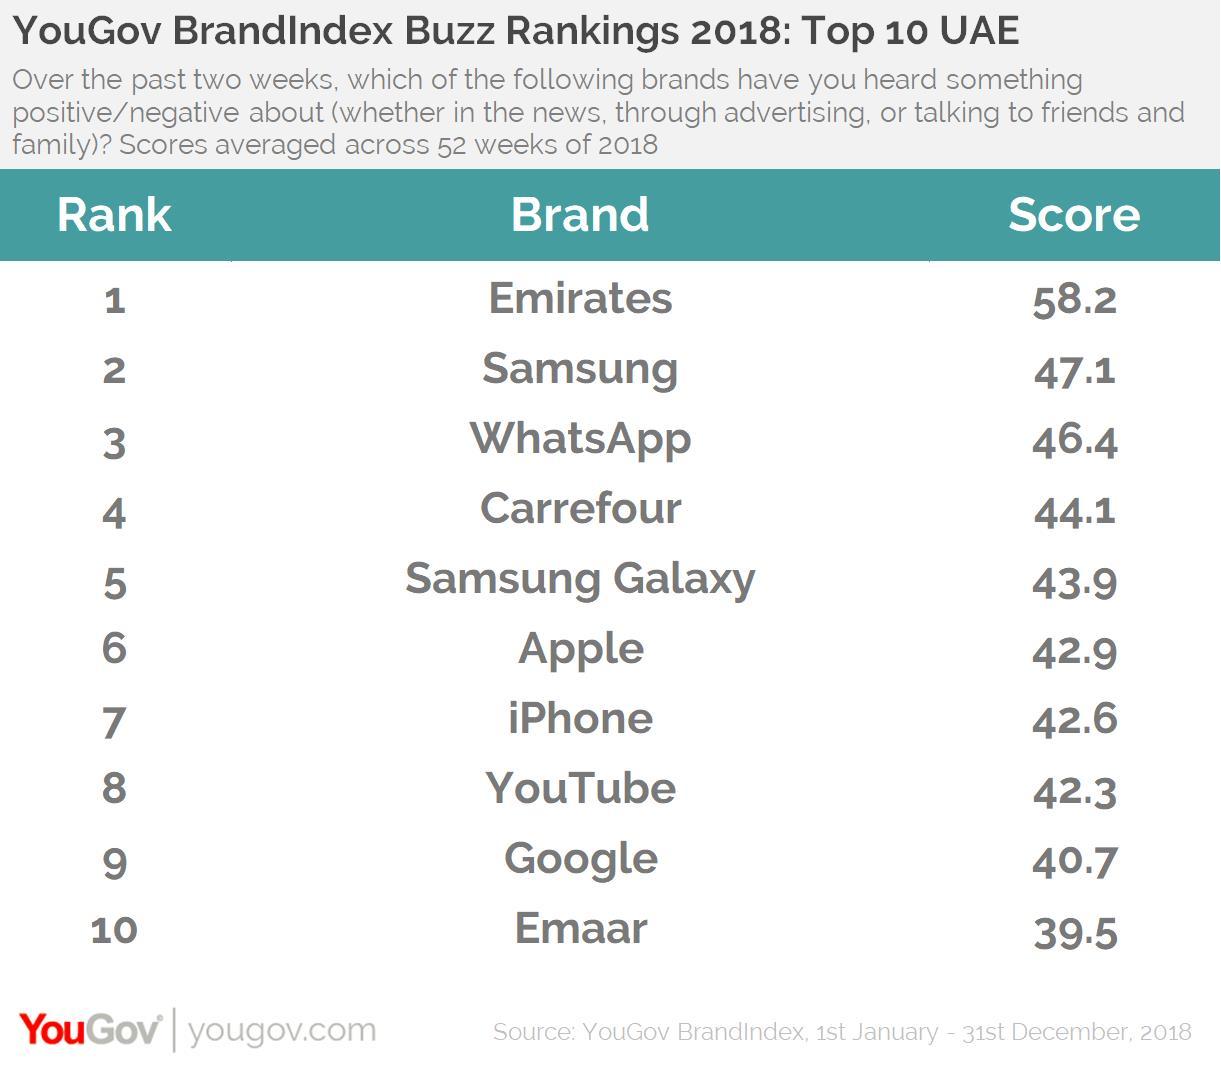 Emirates, Al Baik and WhatsApp top the 2018 YouGov